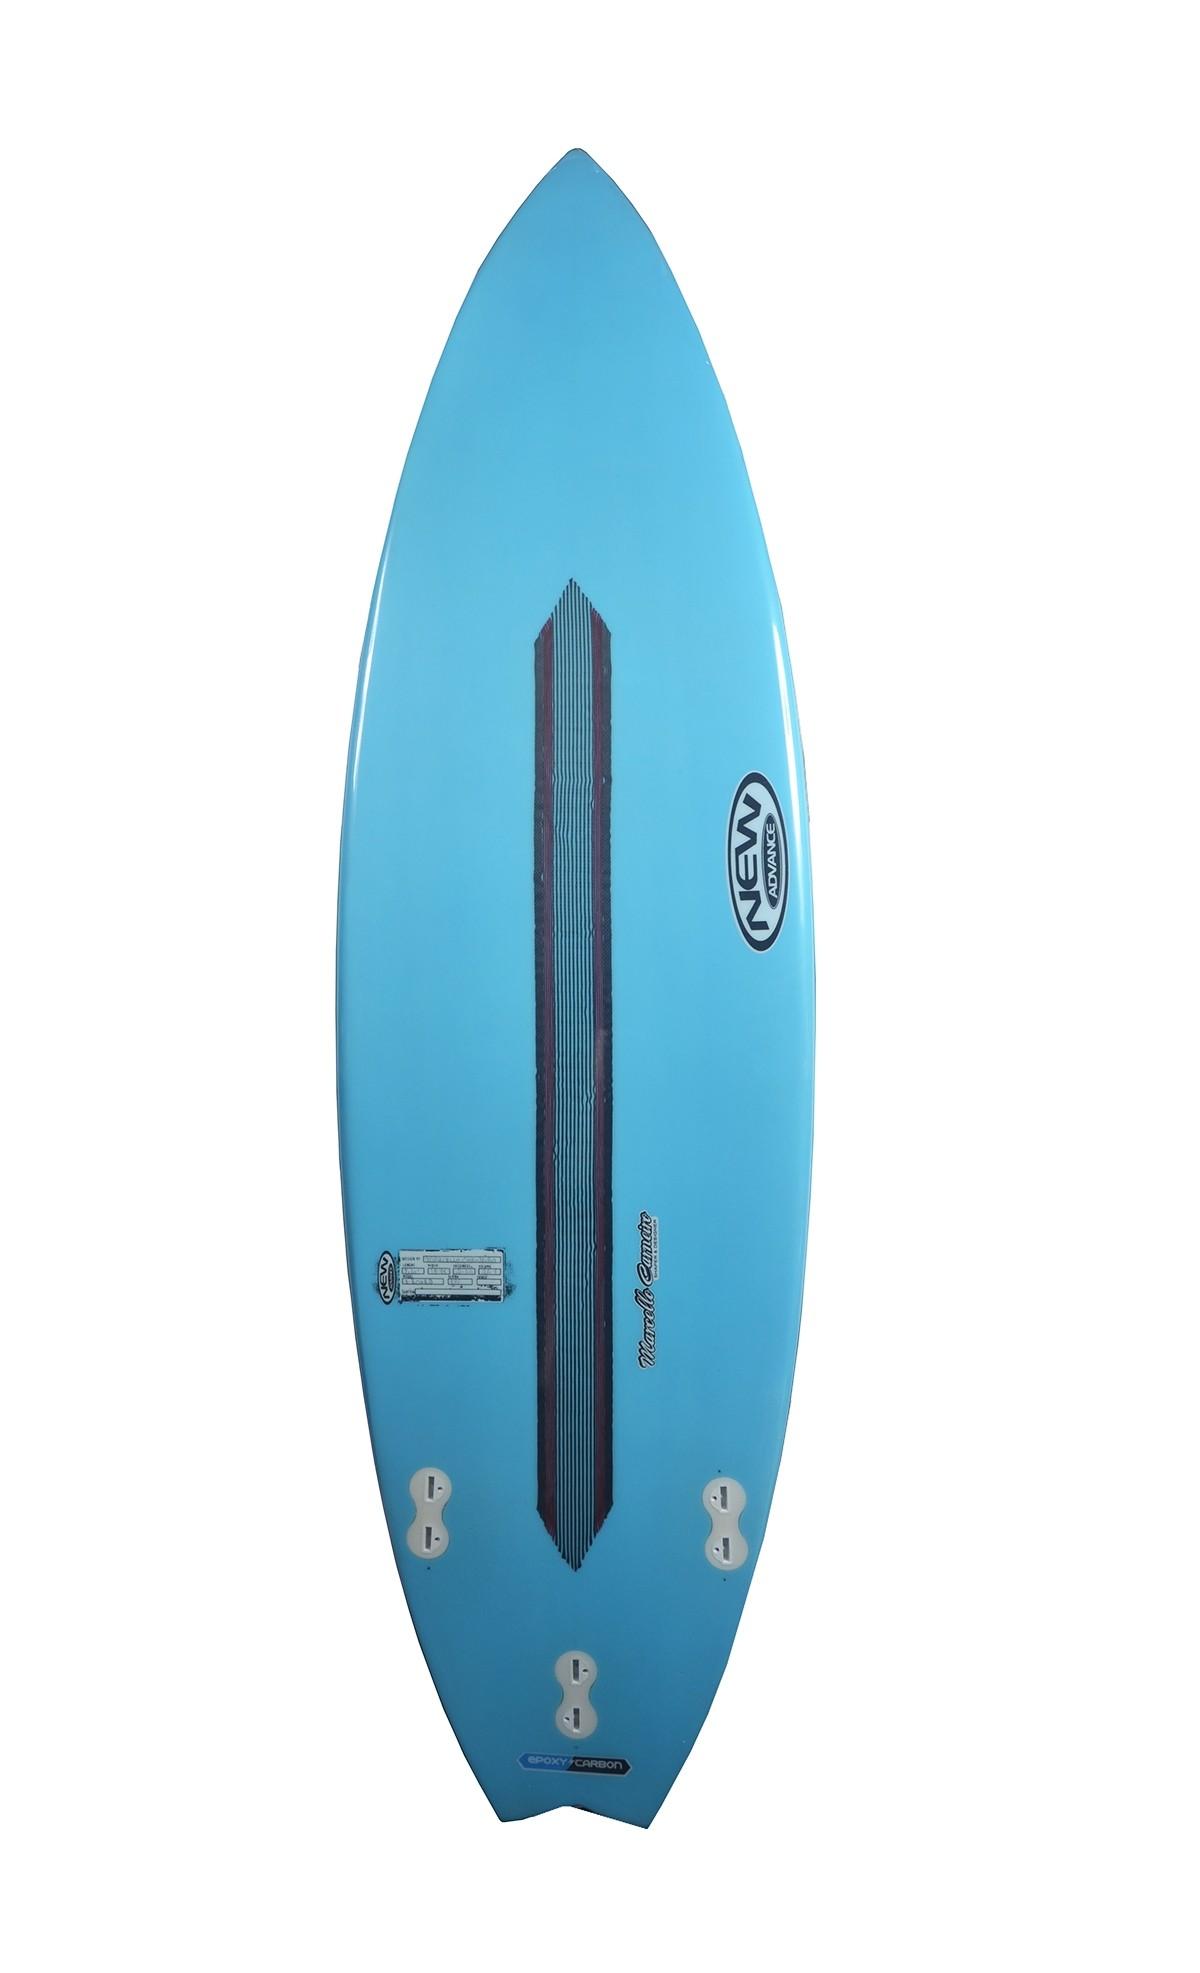 "Prancha de Surf Xboard New Advance 5'10"" EPS + Epoxi"